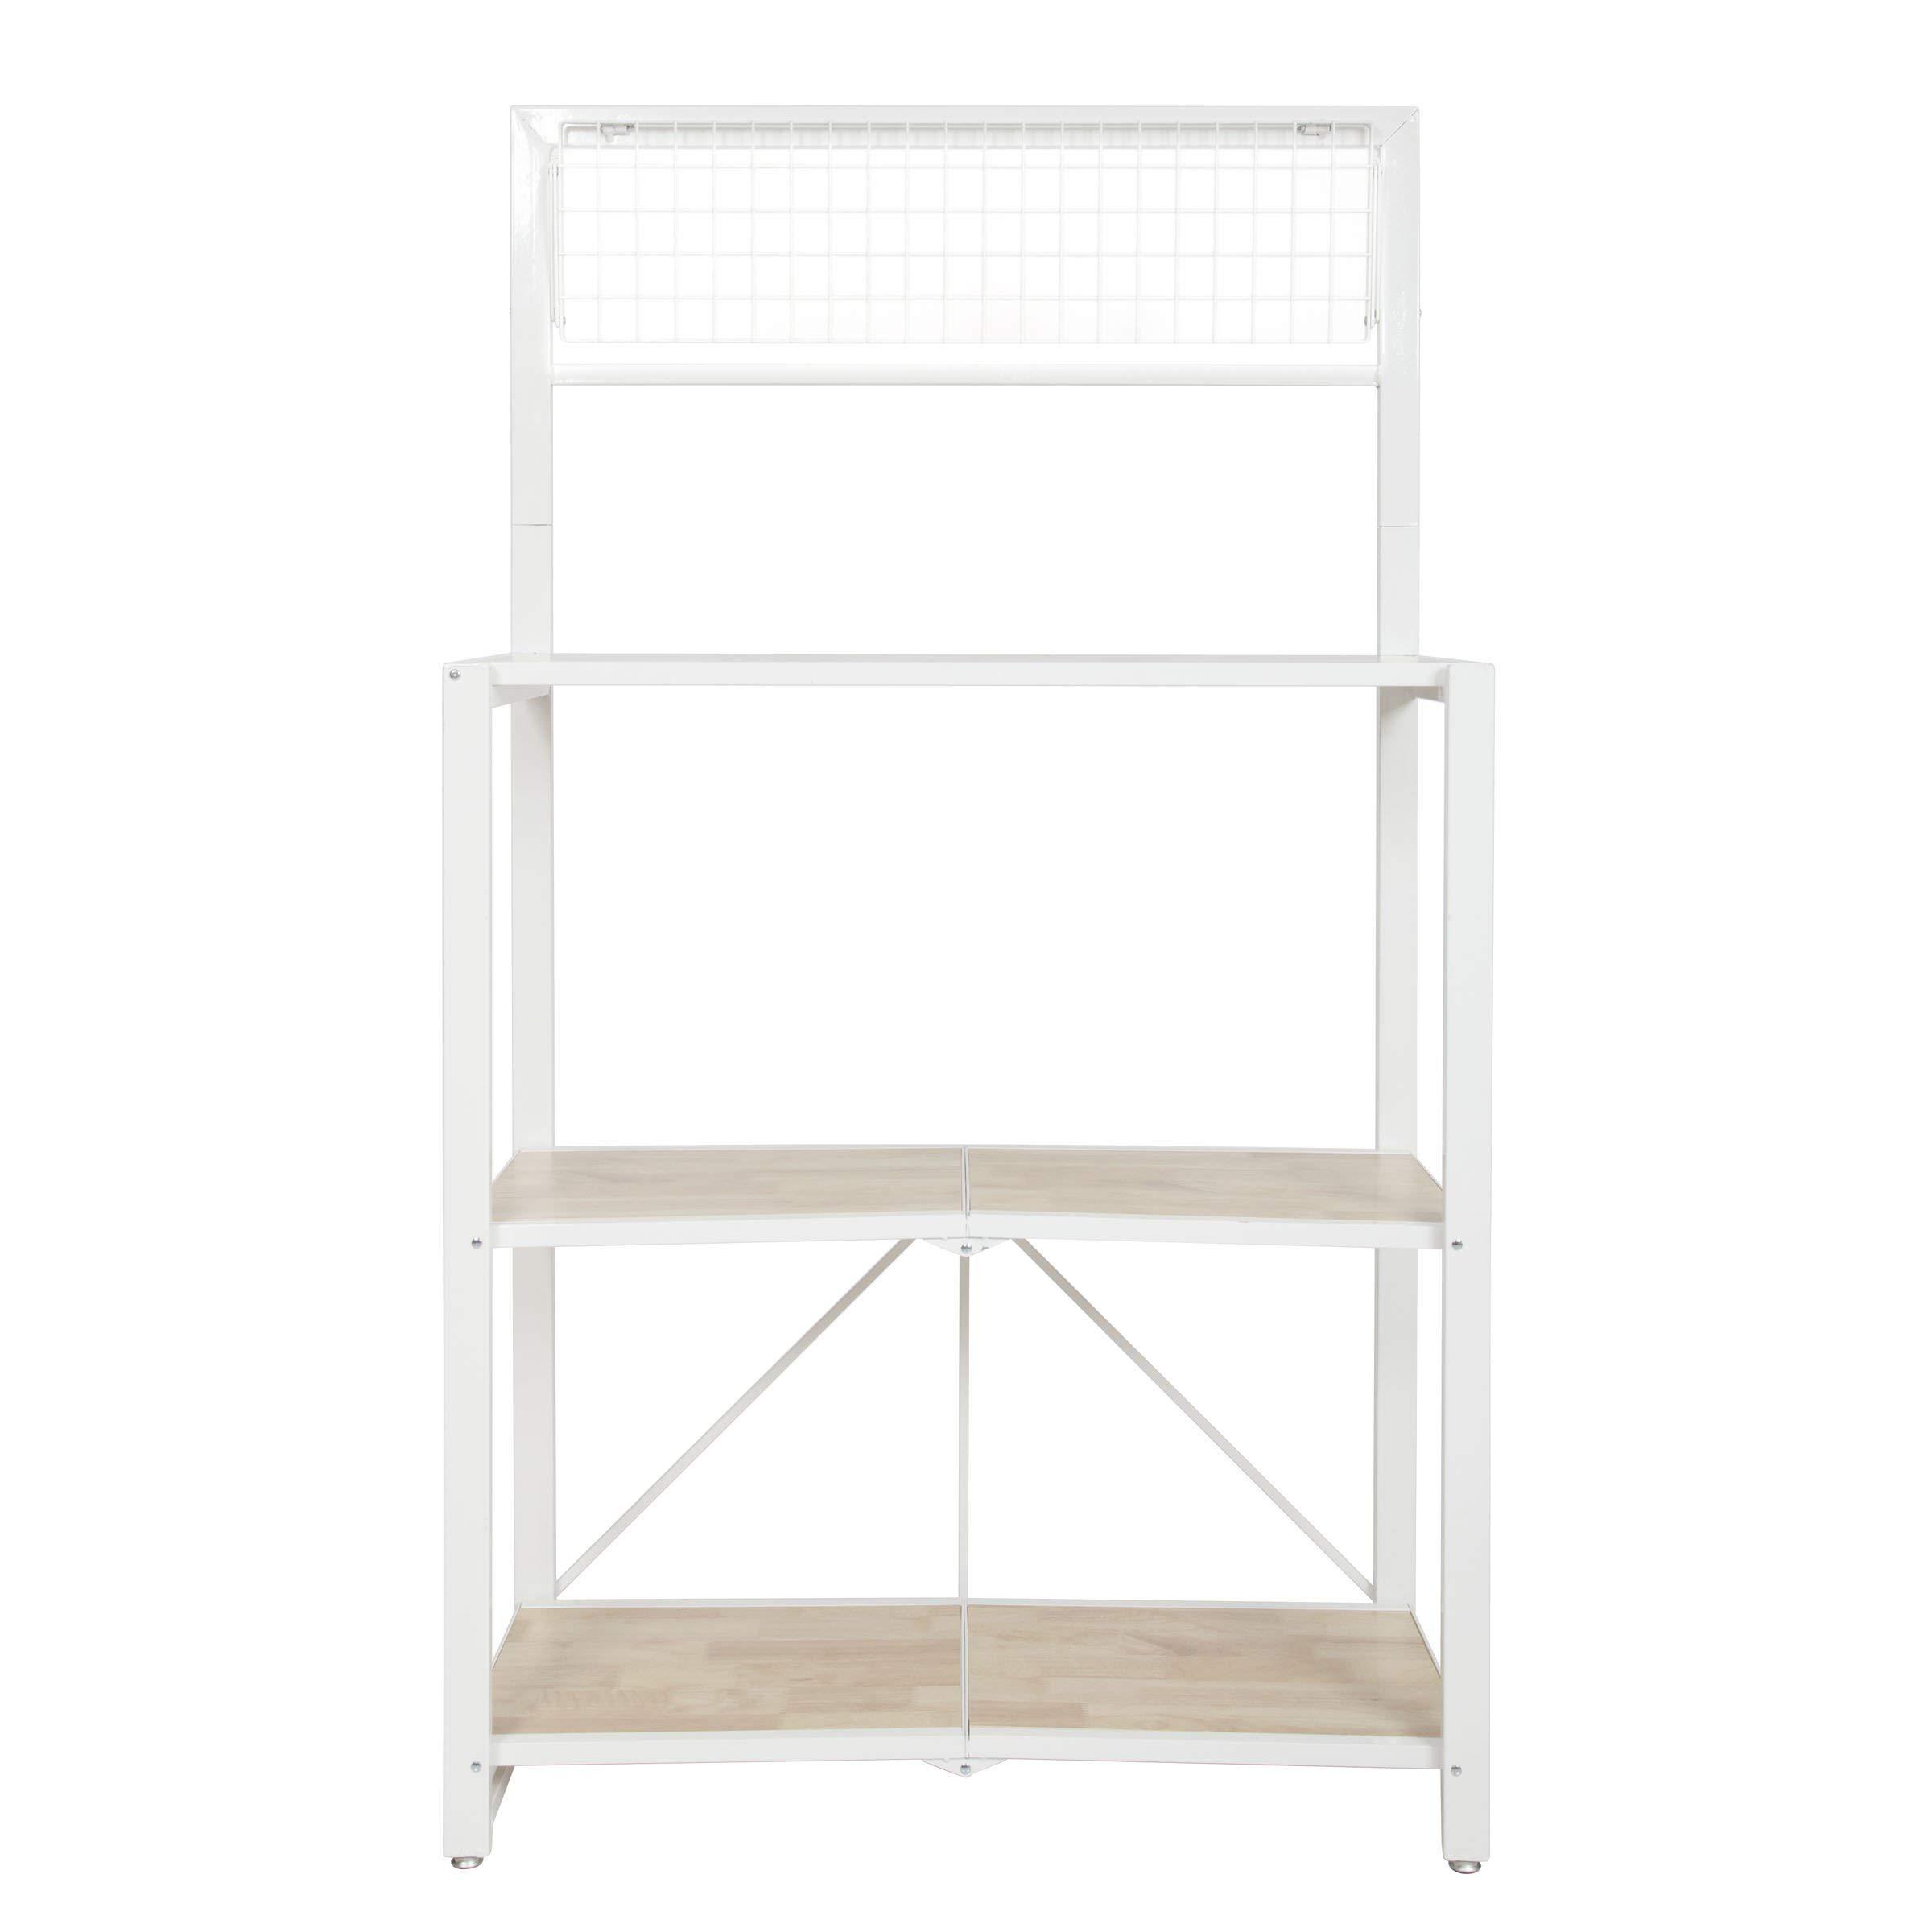 Origami Folding 4-Tier Heavy Duty Steel Baker's Rack with Wood Shelf, White by Origami (Image #2)